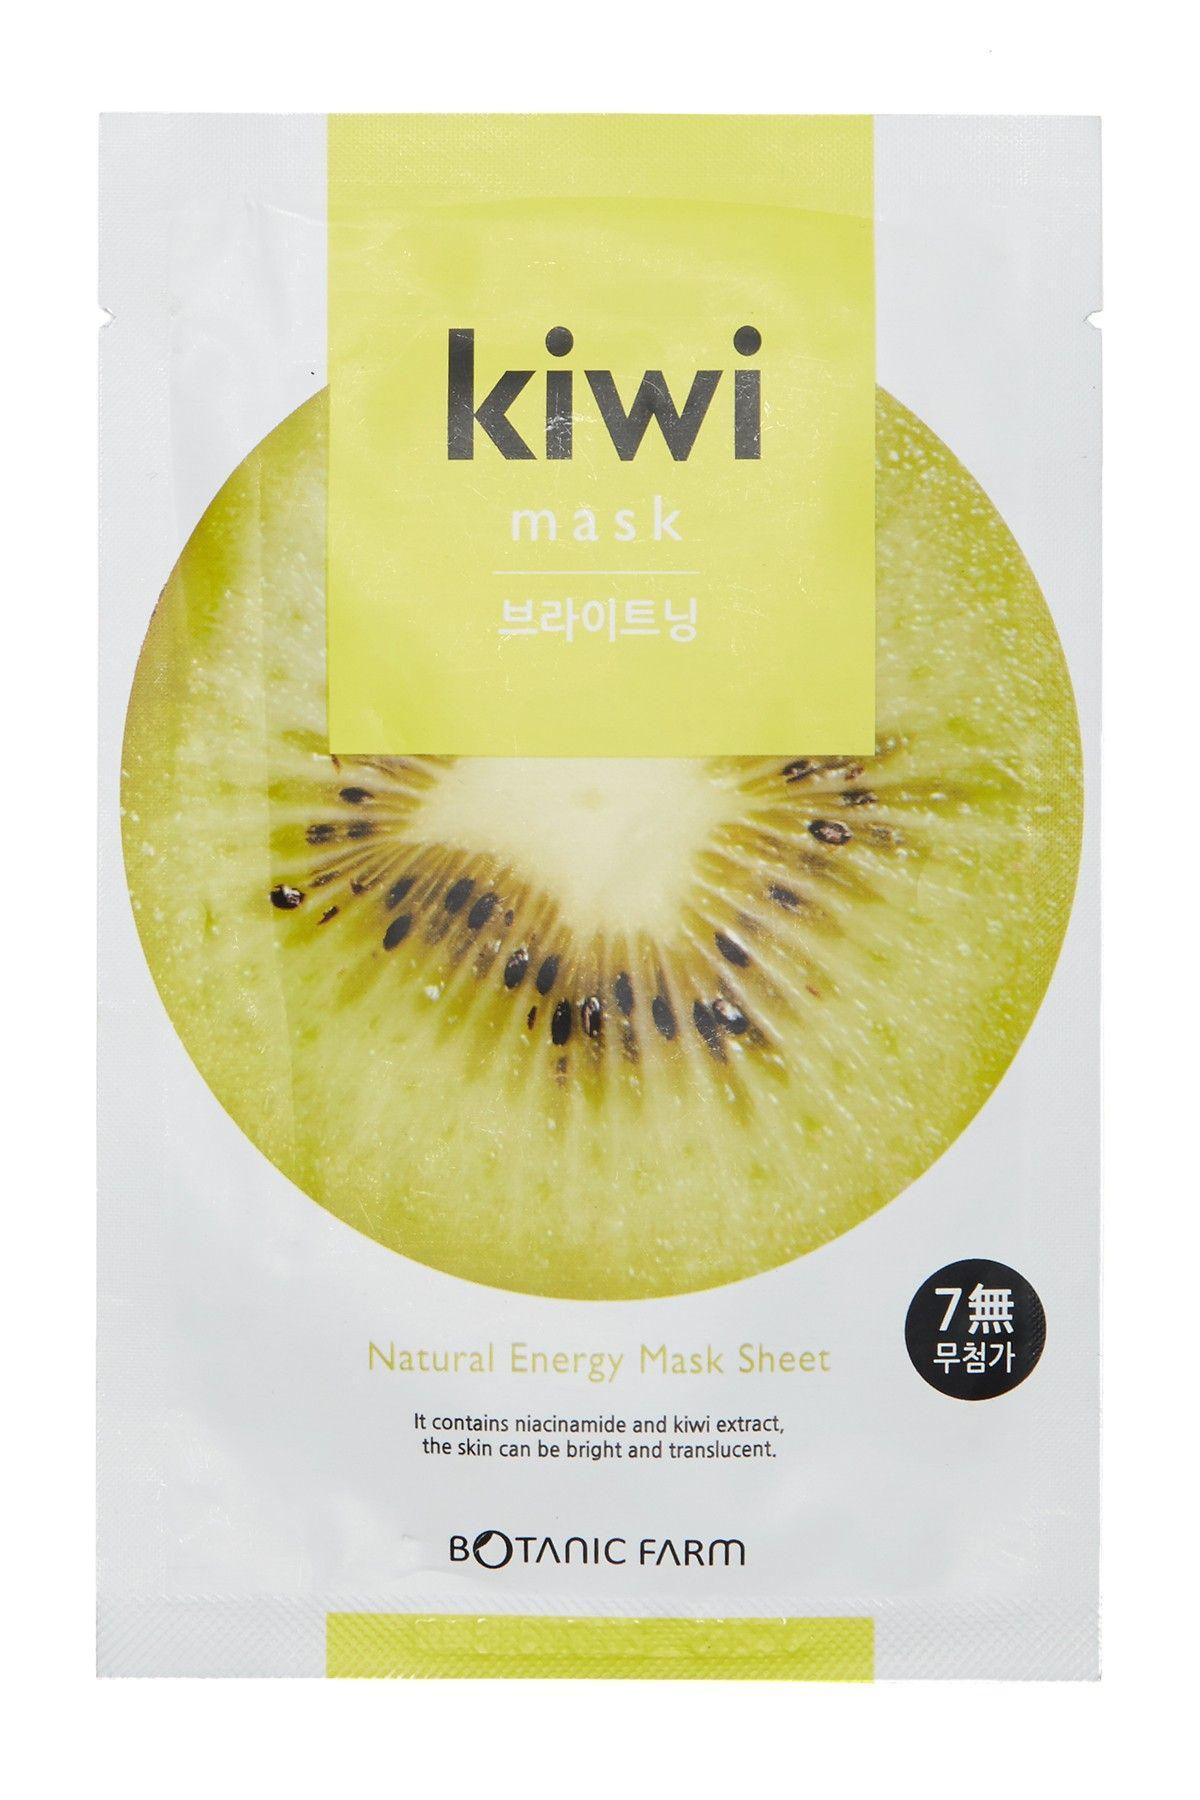 10 Best Kiwifruit Face Masks You Must Try 10 Best Kiwifruit Face Masks You Must Try new foto